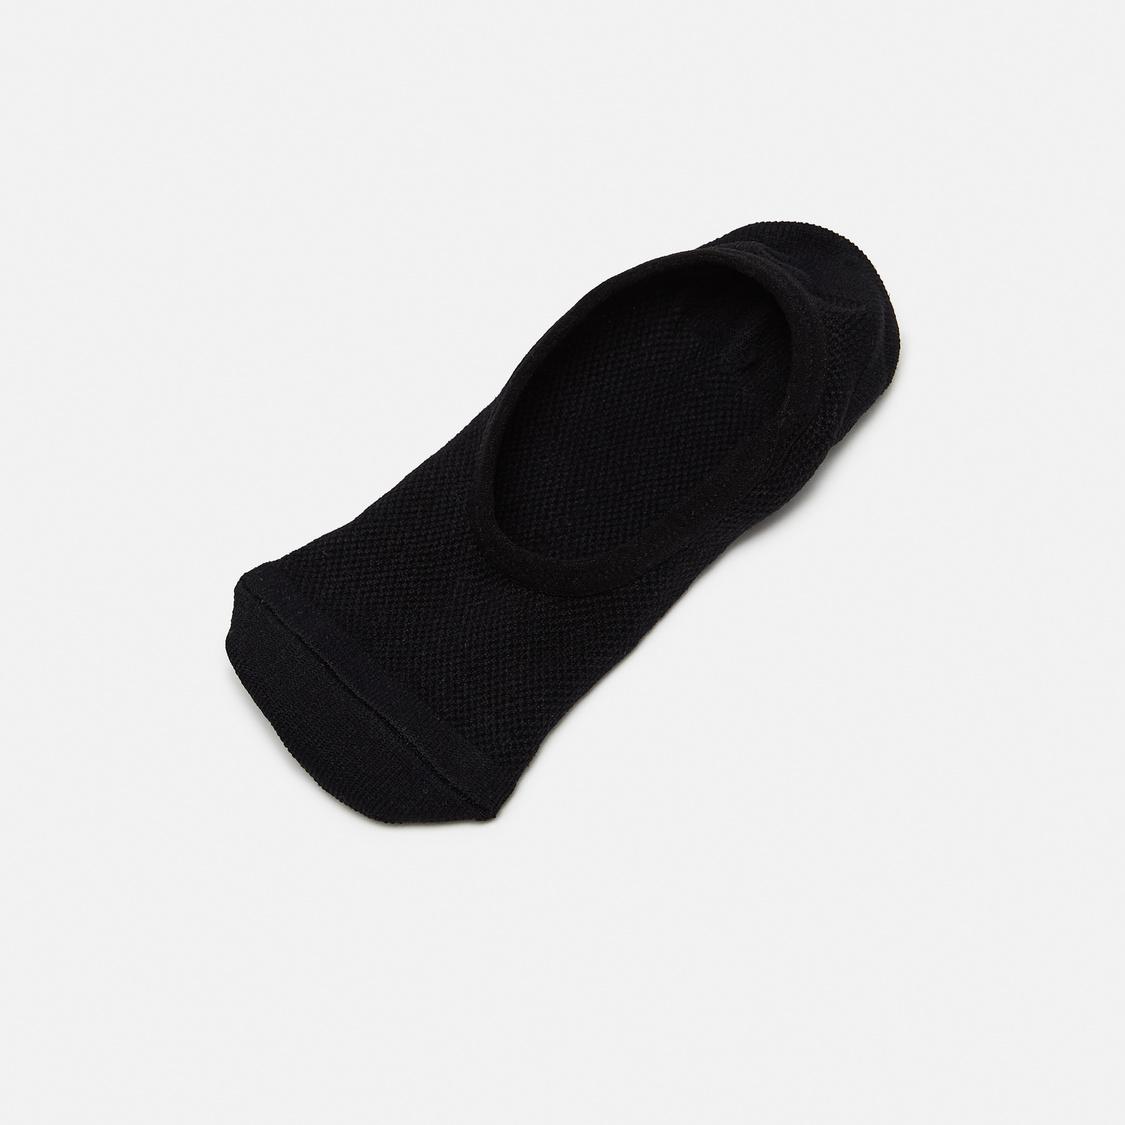 Set of 5 - Textured No Show Socks